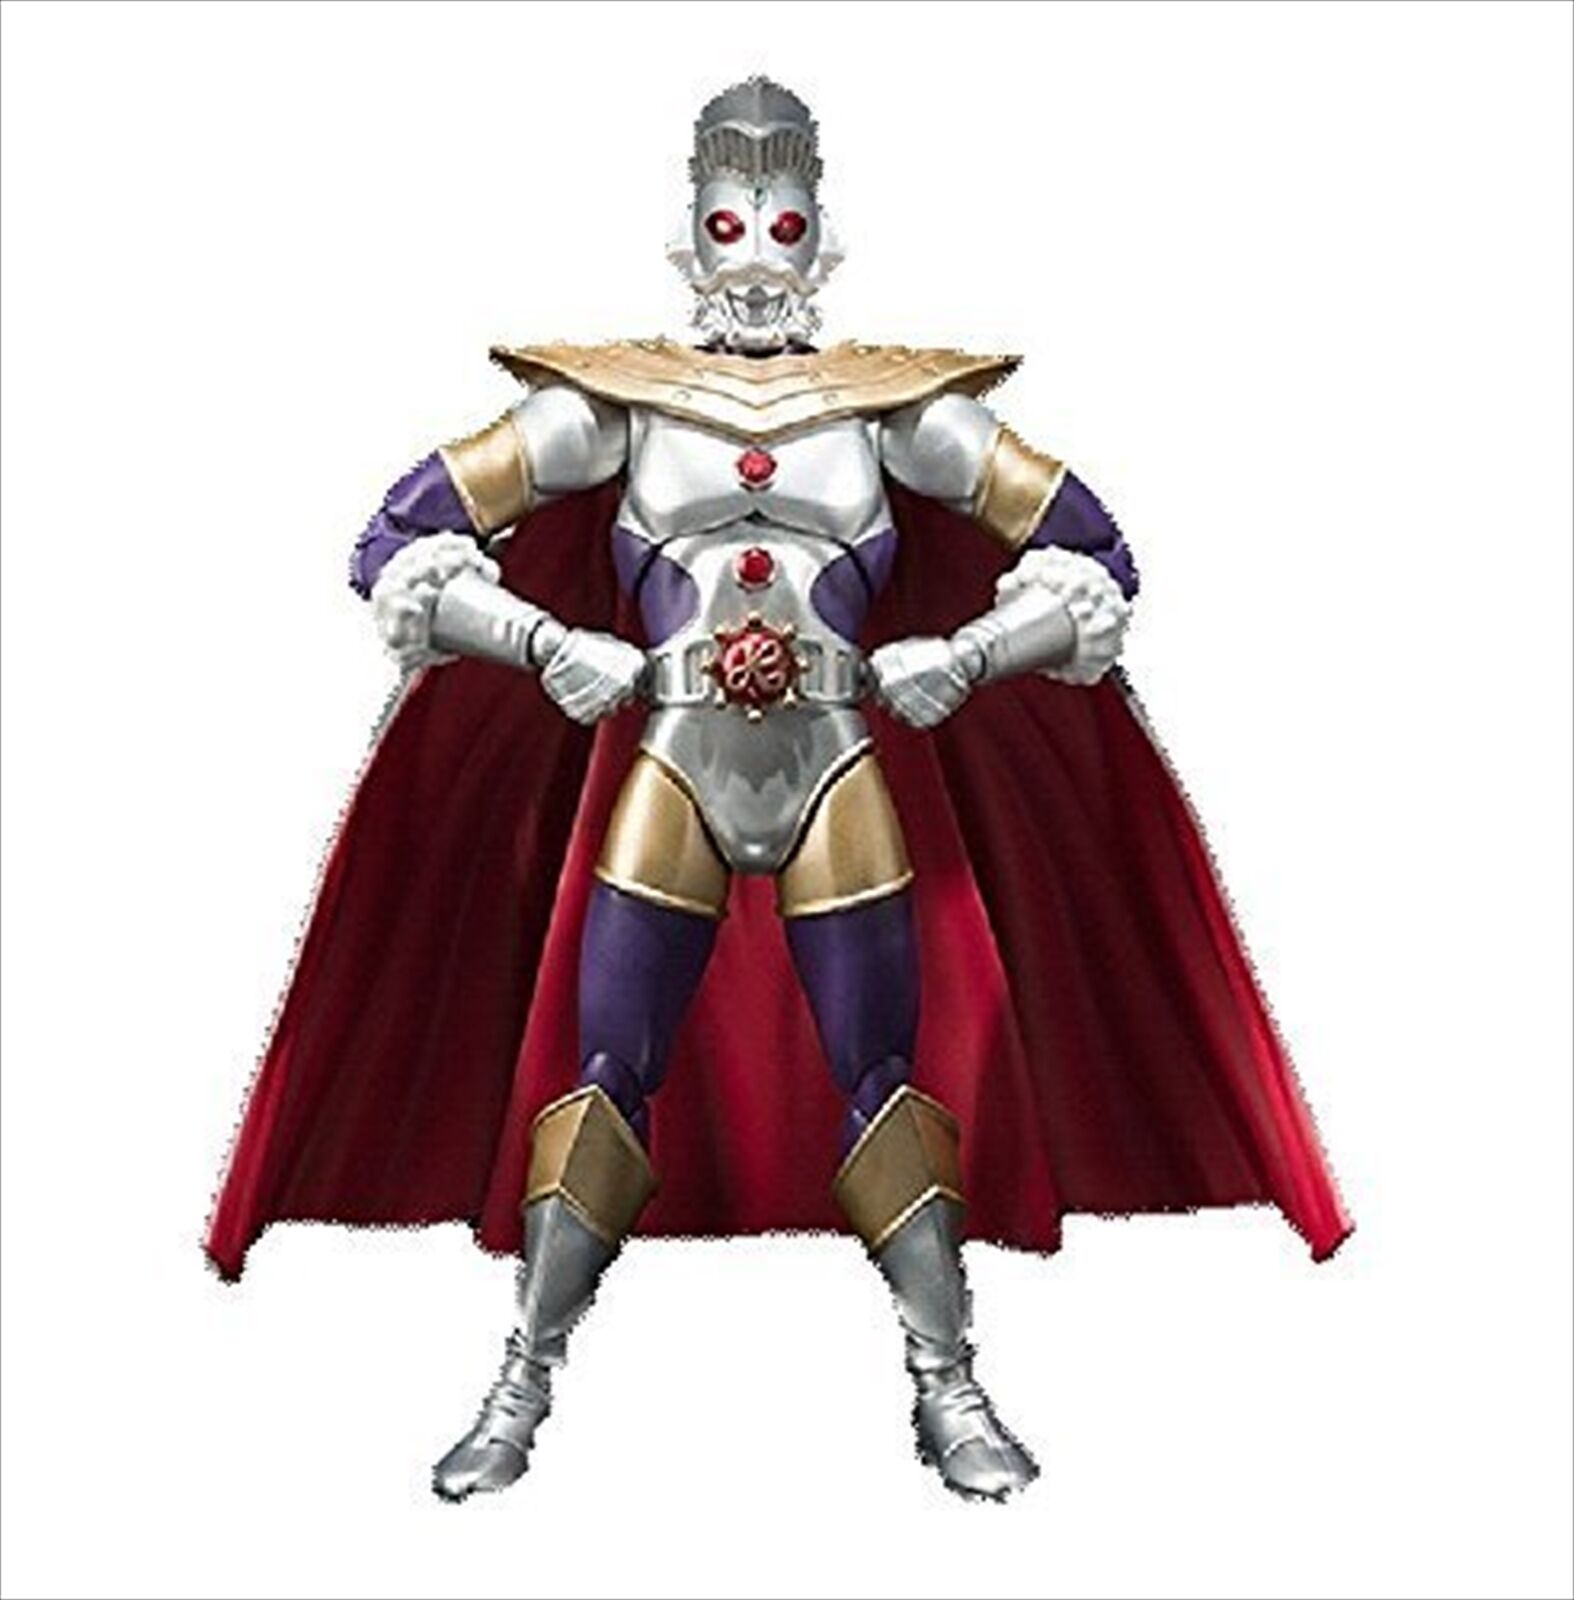 Bandai Tamashii Nations Ultra-acto Ultraman Rey Figura de acción